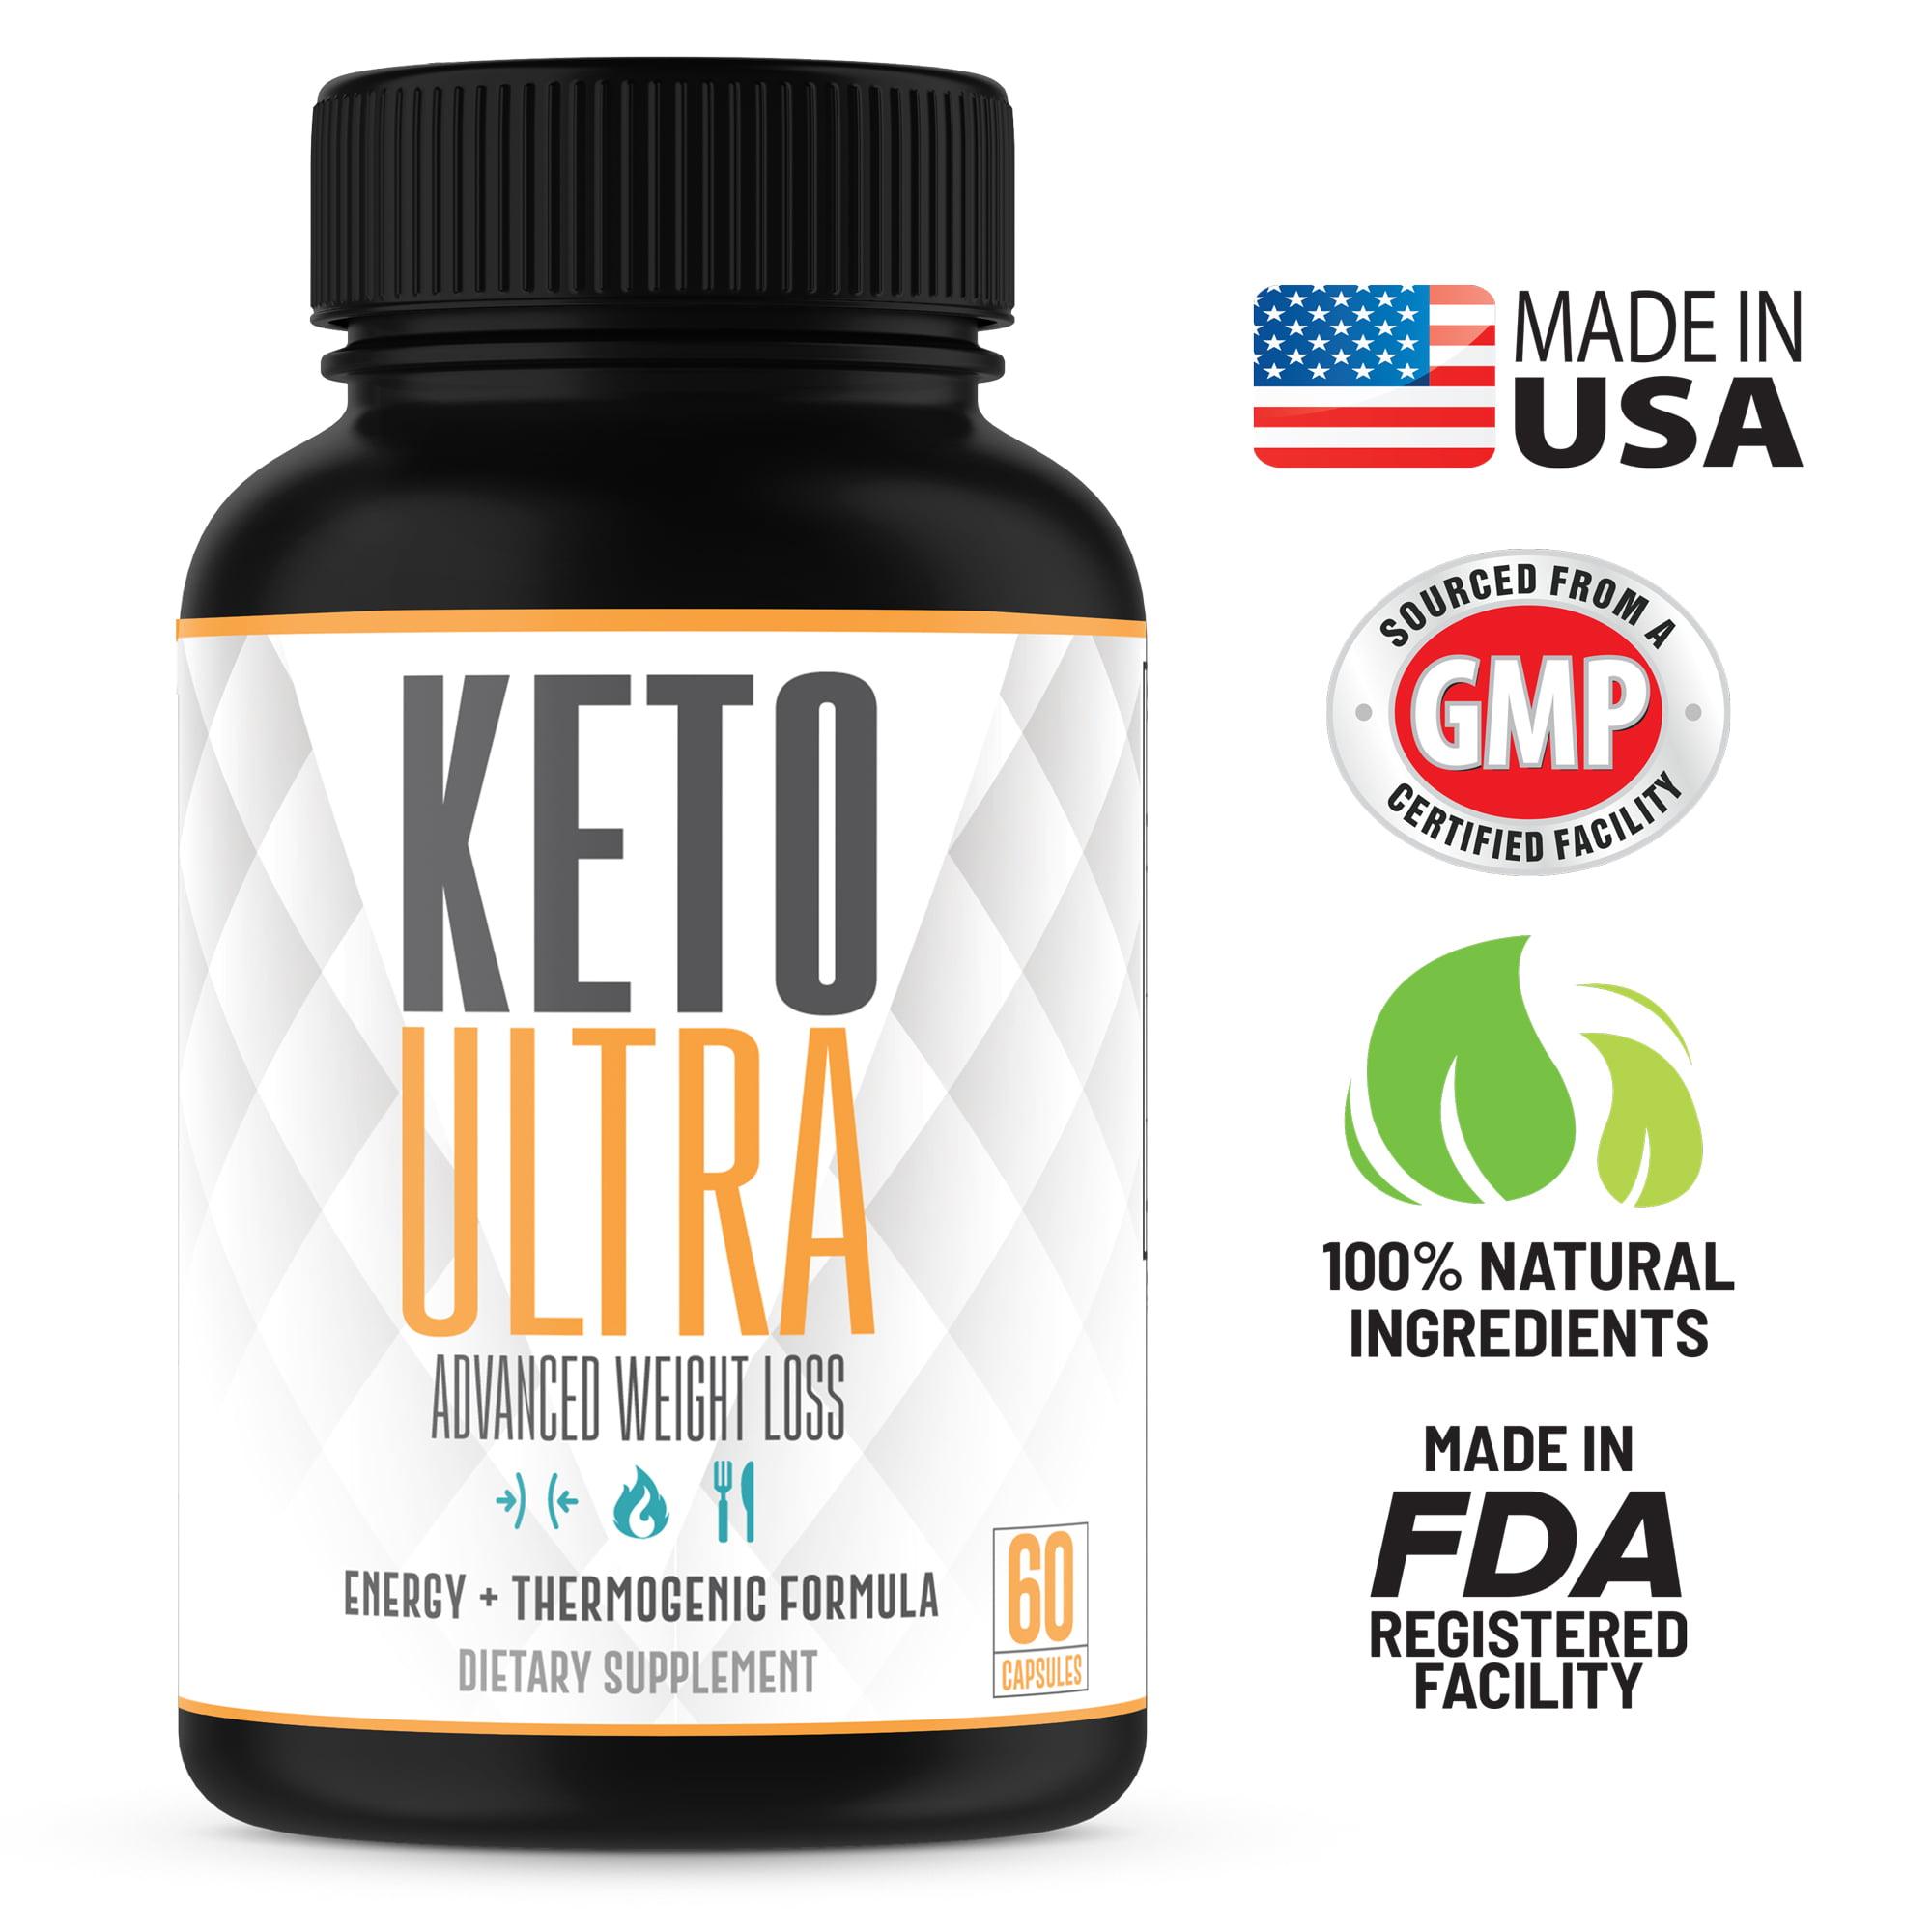 keto ultra diet supplements